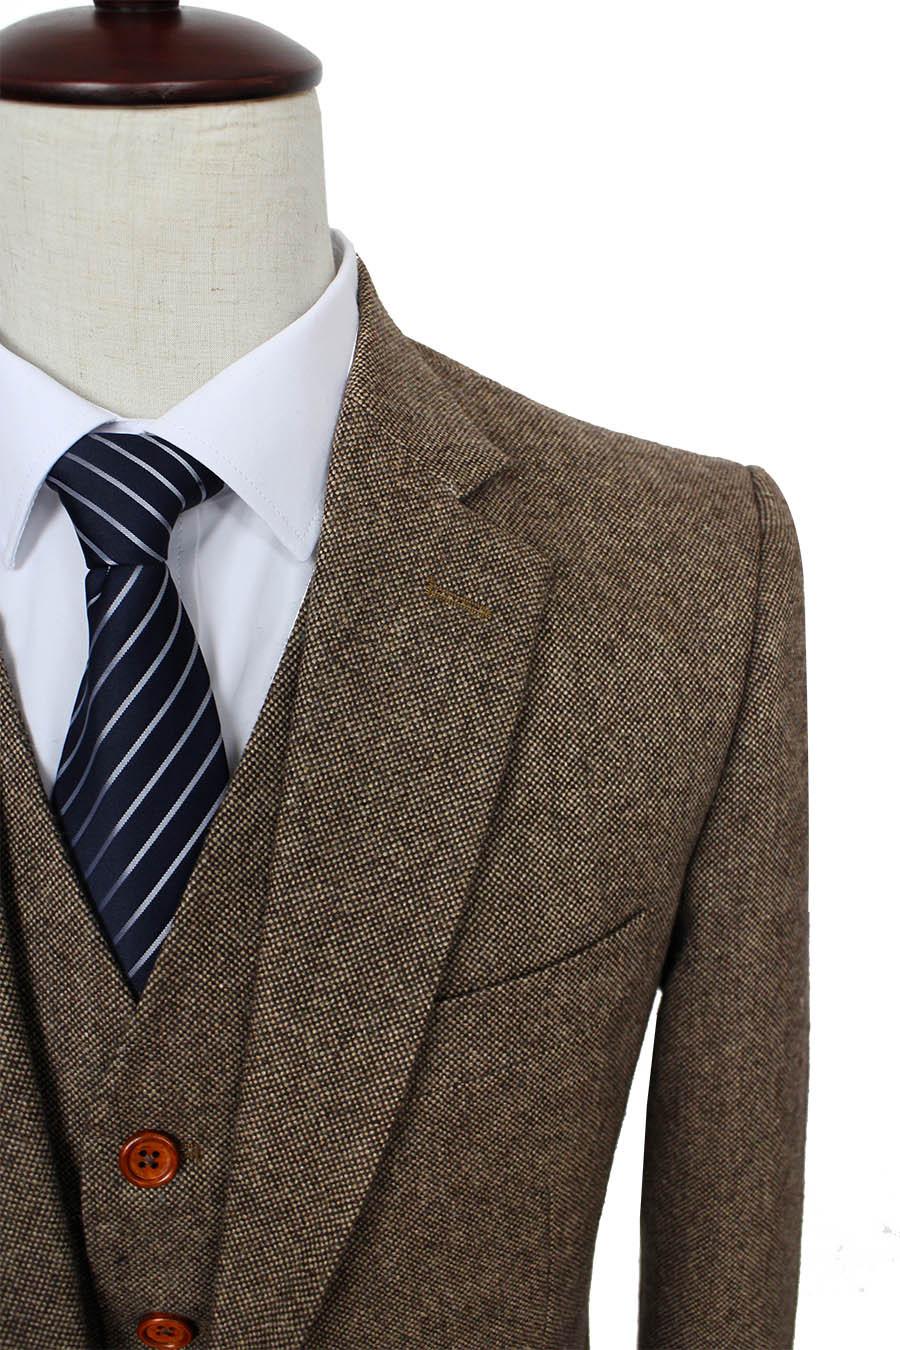 Brown Classic Tweed custom made men slim fit suit Blazers Retro gentleman style tailor made wedding